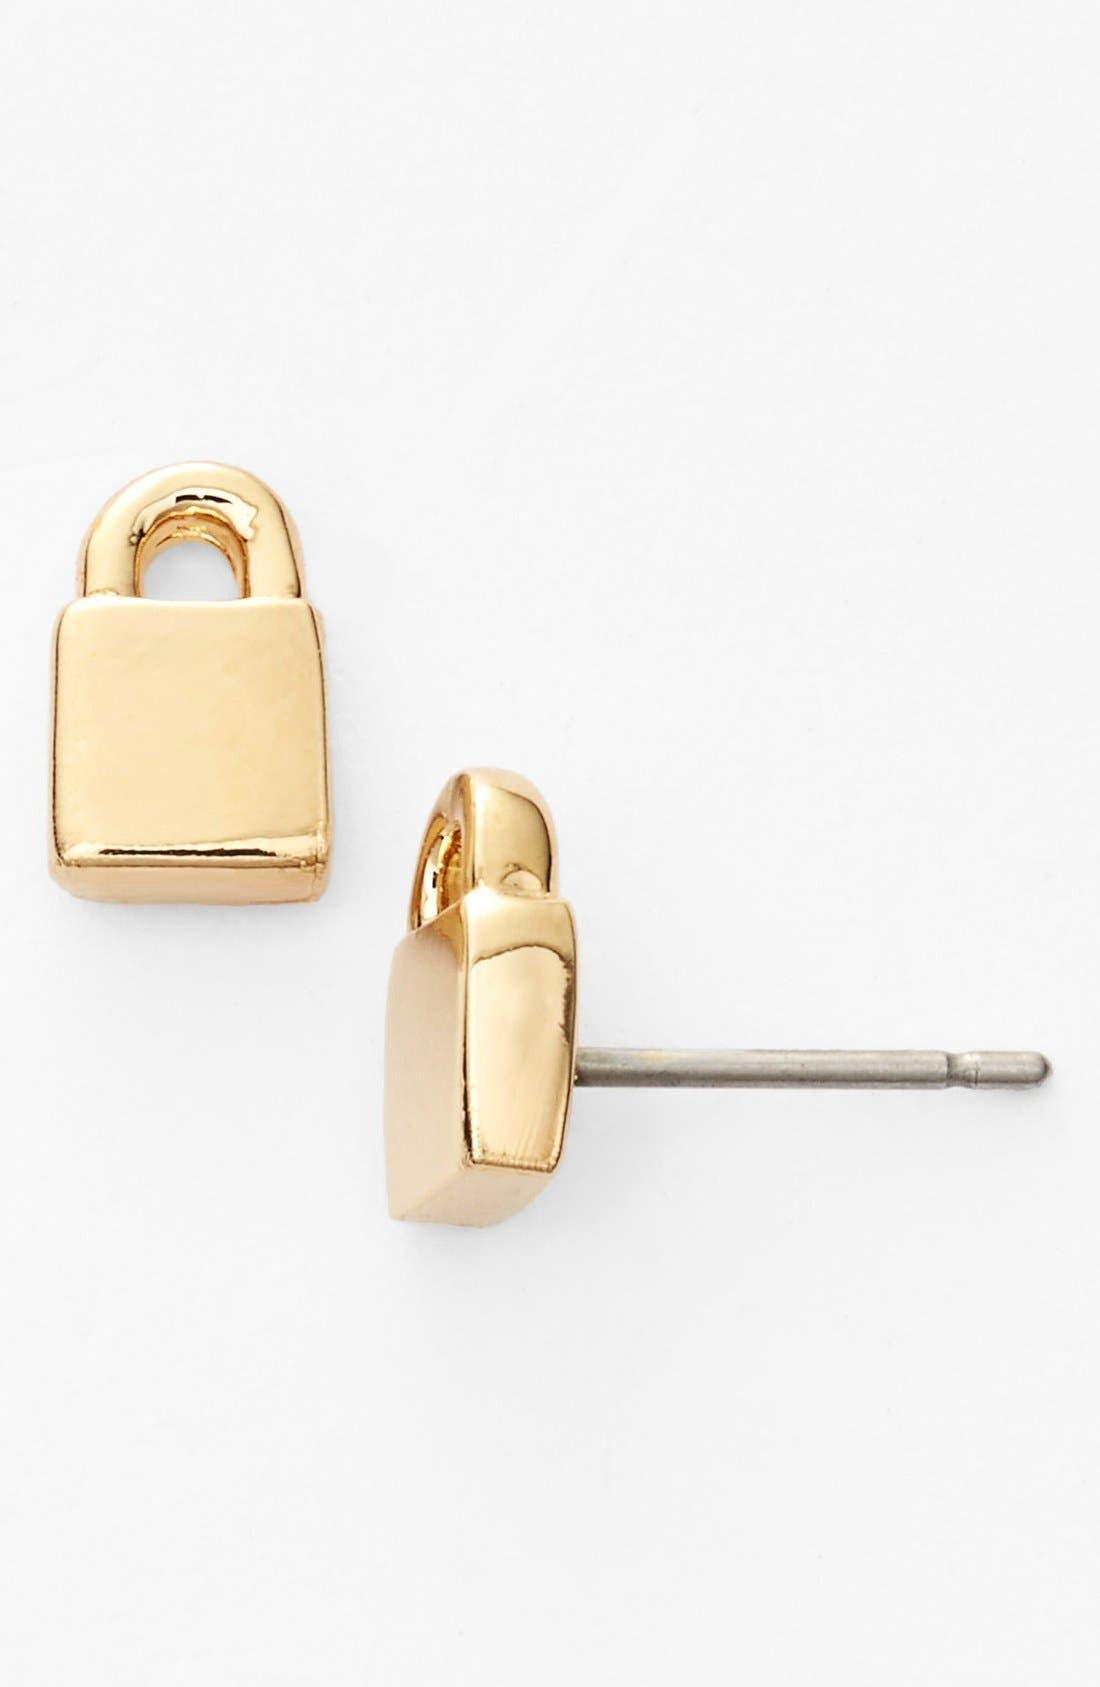 Main Image - MARC BY MARC JACOBS 'Locked in Orbit' Lock Stud Earrings